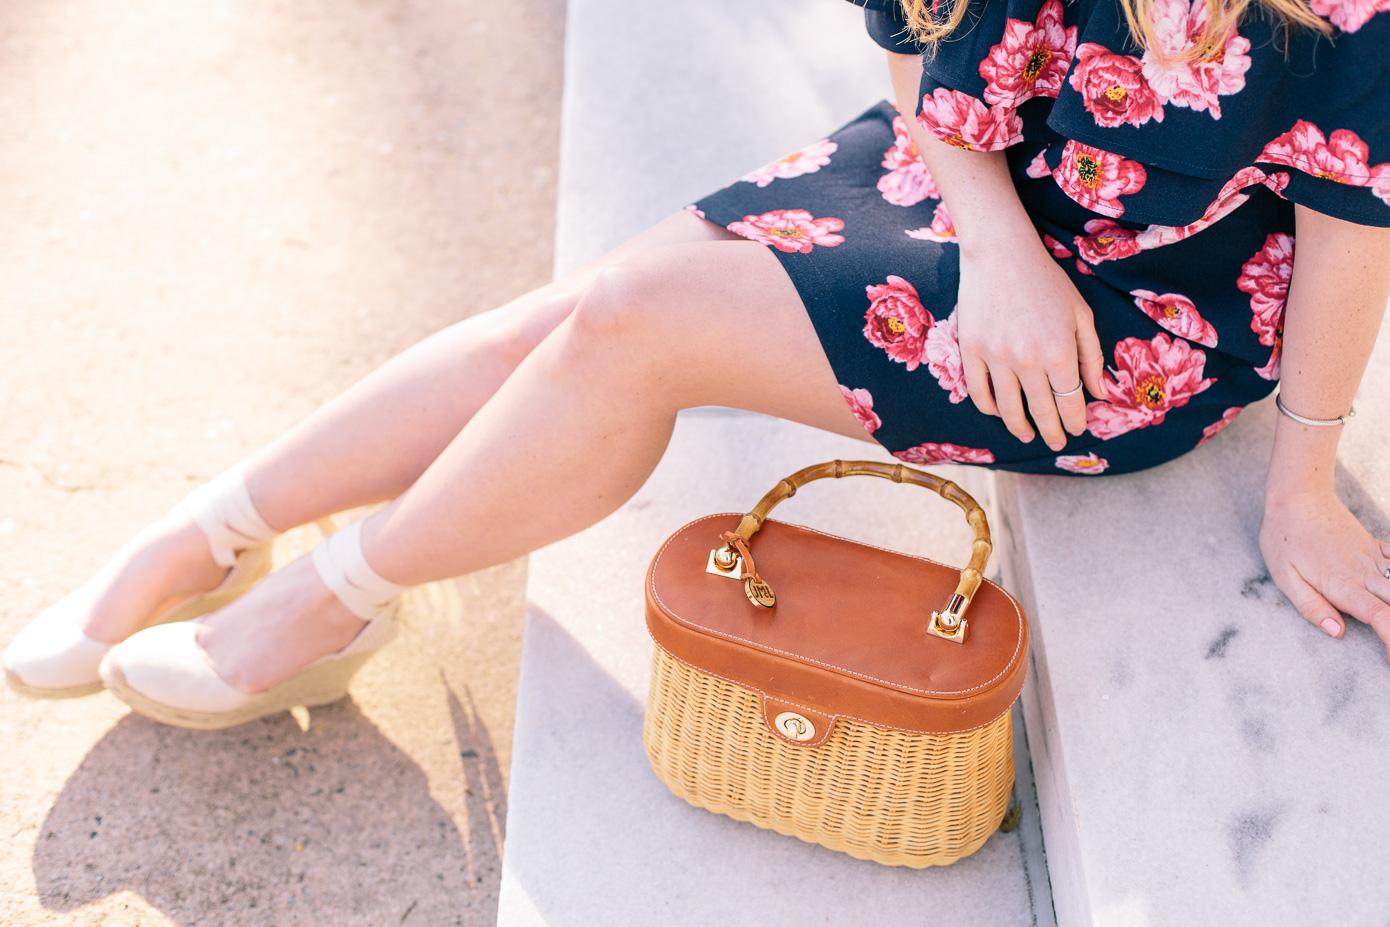 Navy and Pink Floral Off the Shoulder Dress + Basket Bag | Louella Reese Life & Style Blog